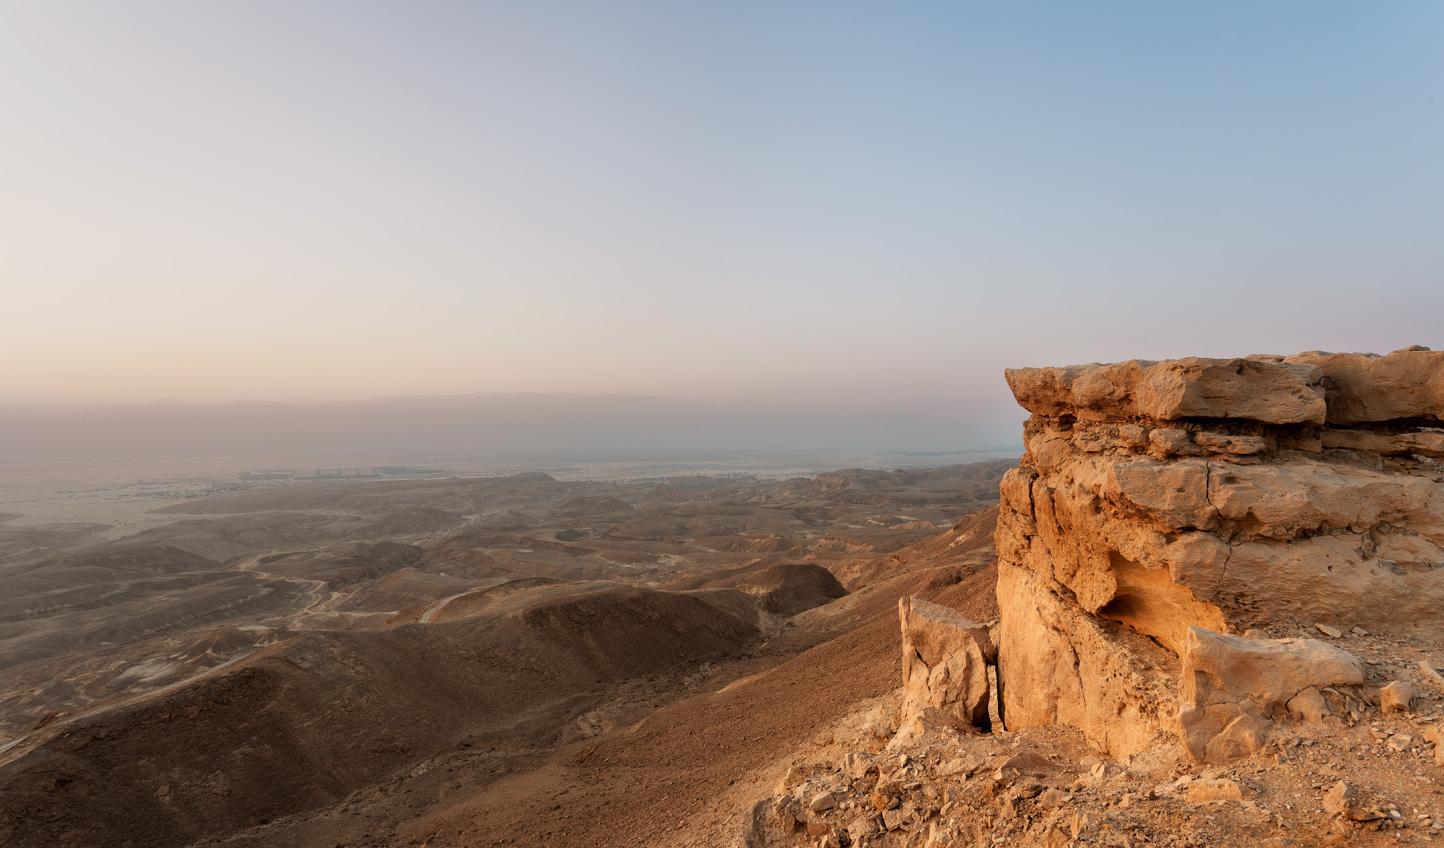 Designed to reflect the mesmerising desert environment